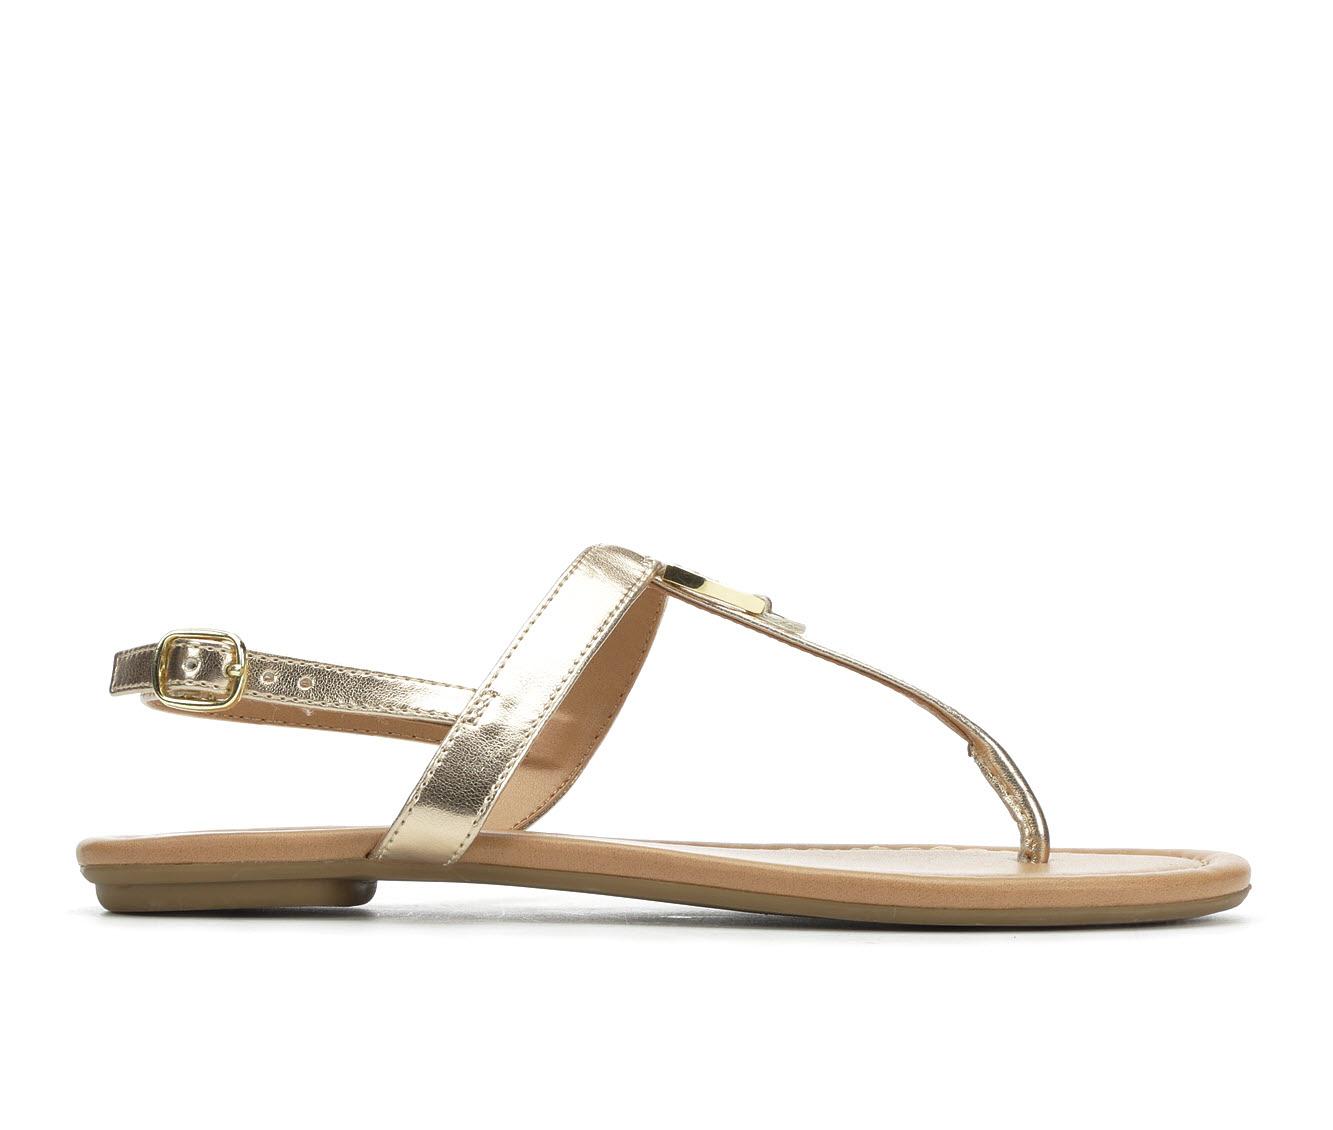 Solanz Gallant Women's Sandal (Gold Faux Leather)